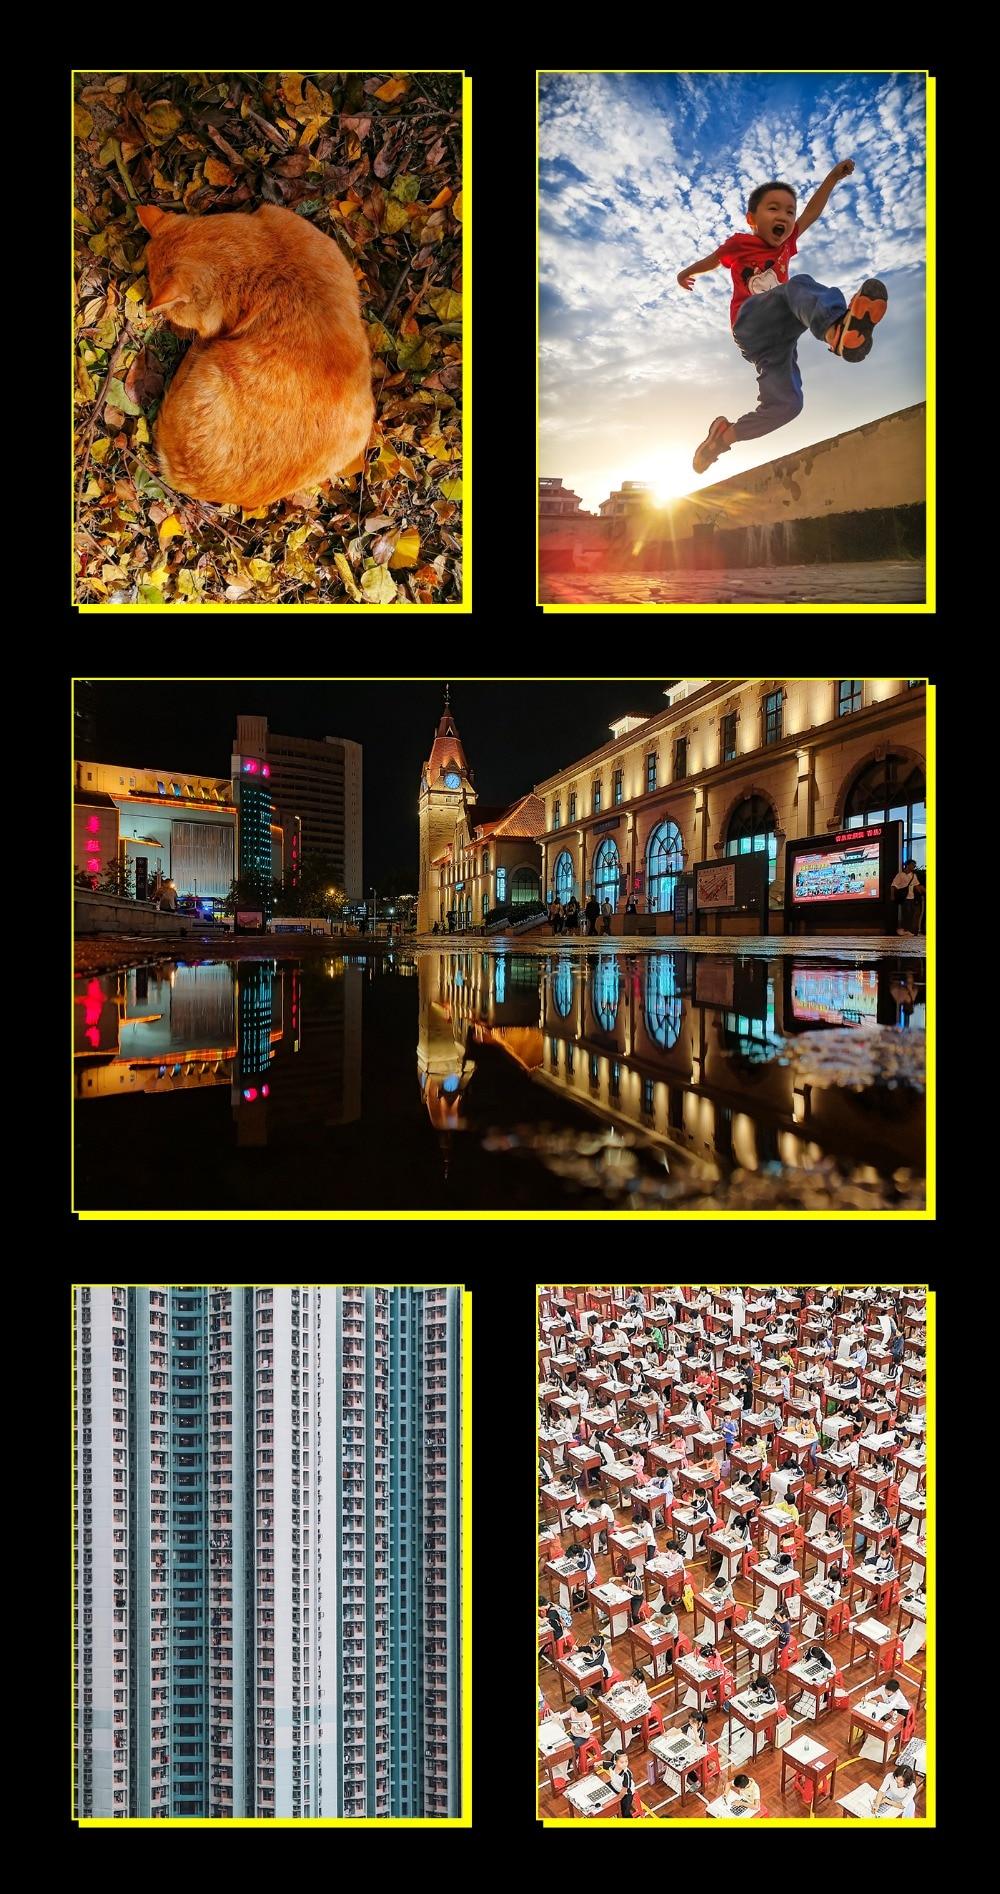 "Ha18414e8f86449fa97b6cd63c2a72b41m UMIDIGI Power 3 Android 10 48MP Quad AI Camera 6150mAh 6.53"" FHD+ 4GB 64GB Helio P60 Global Version Smartphone NFC Pre-sale"